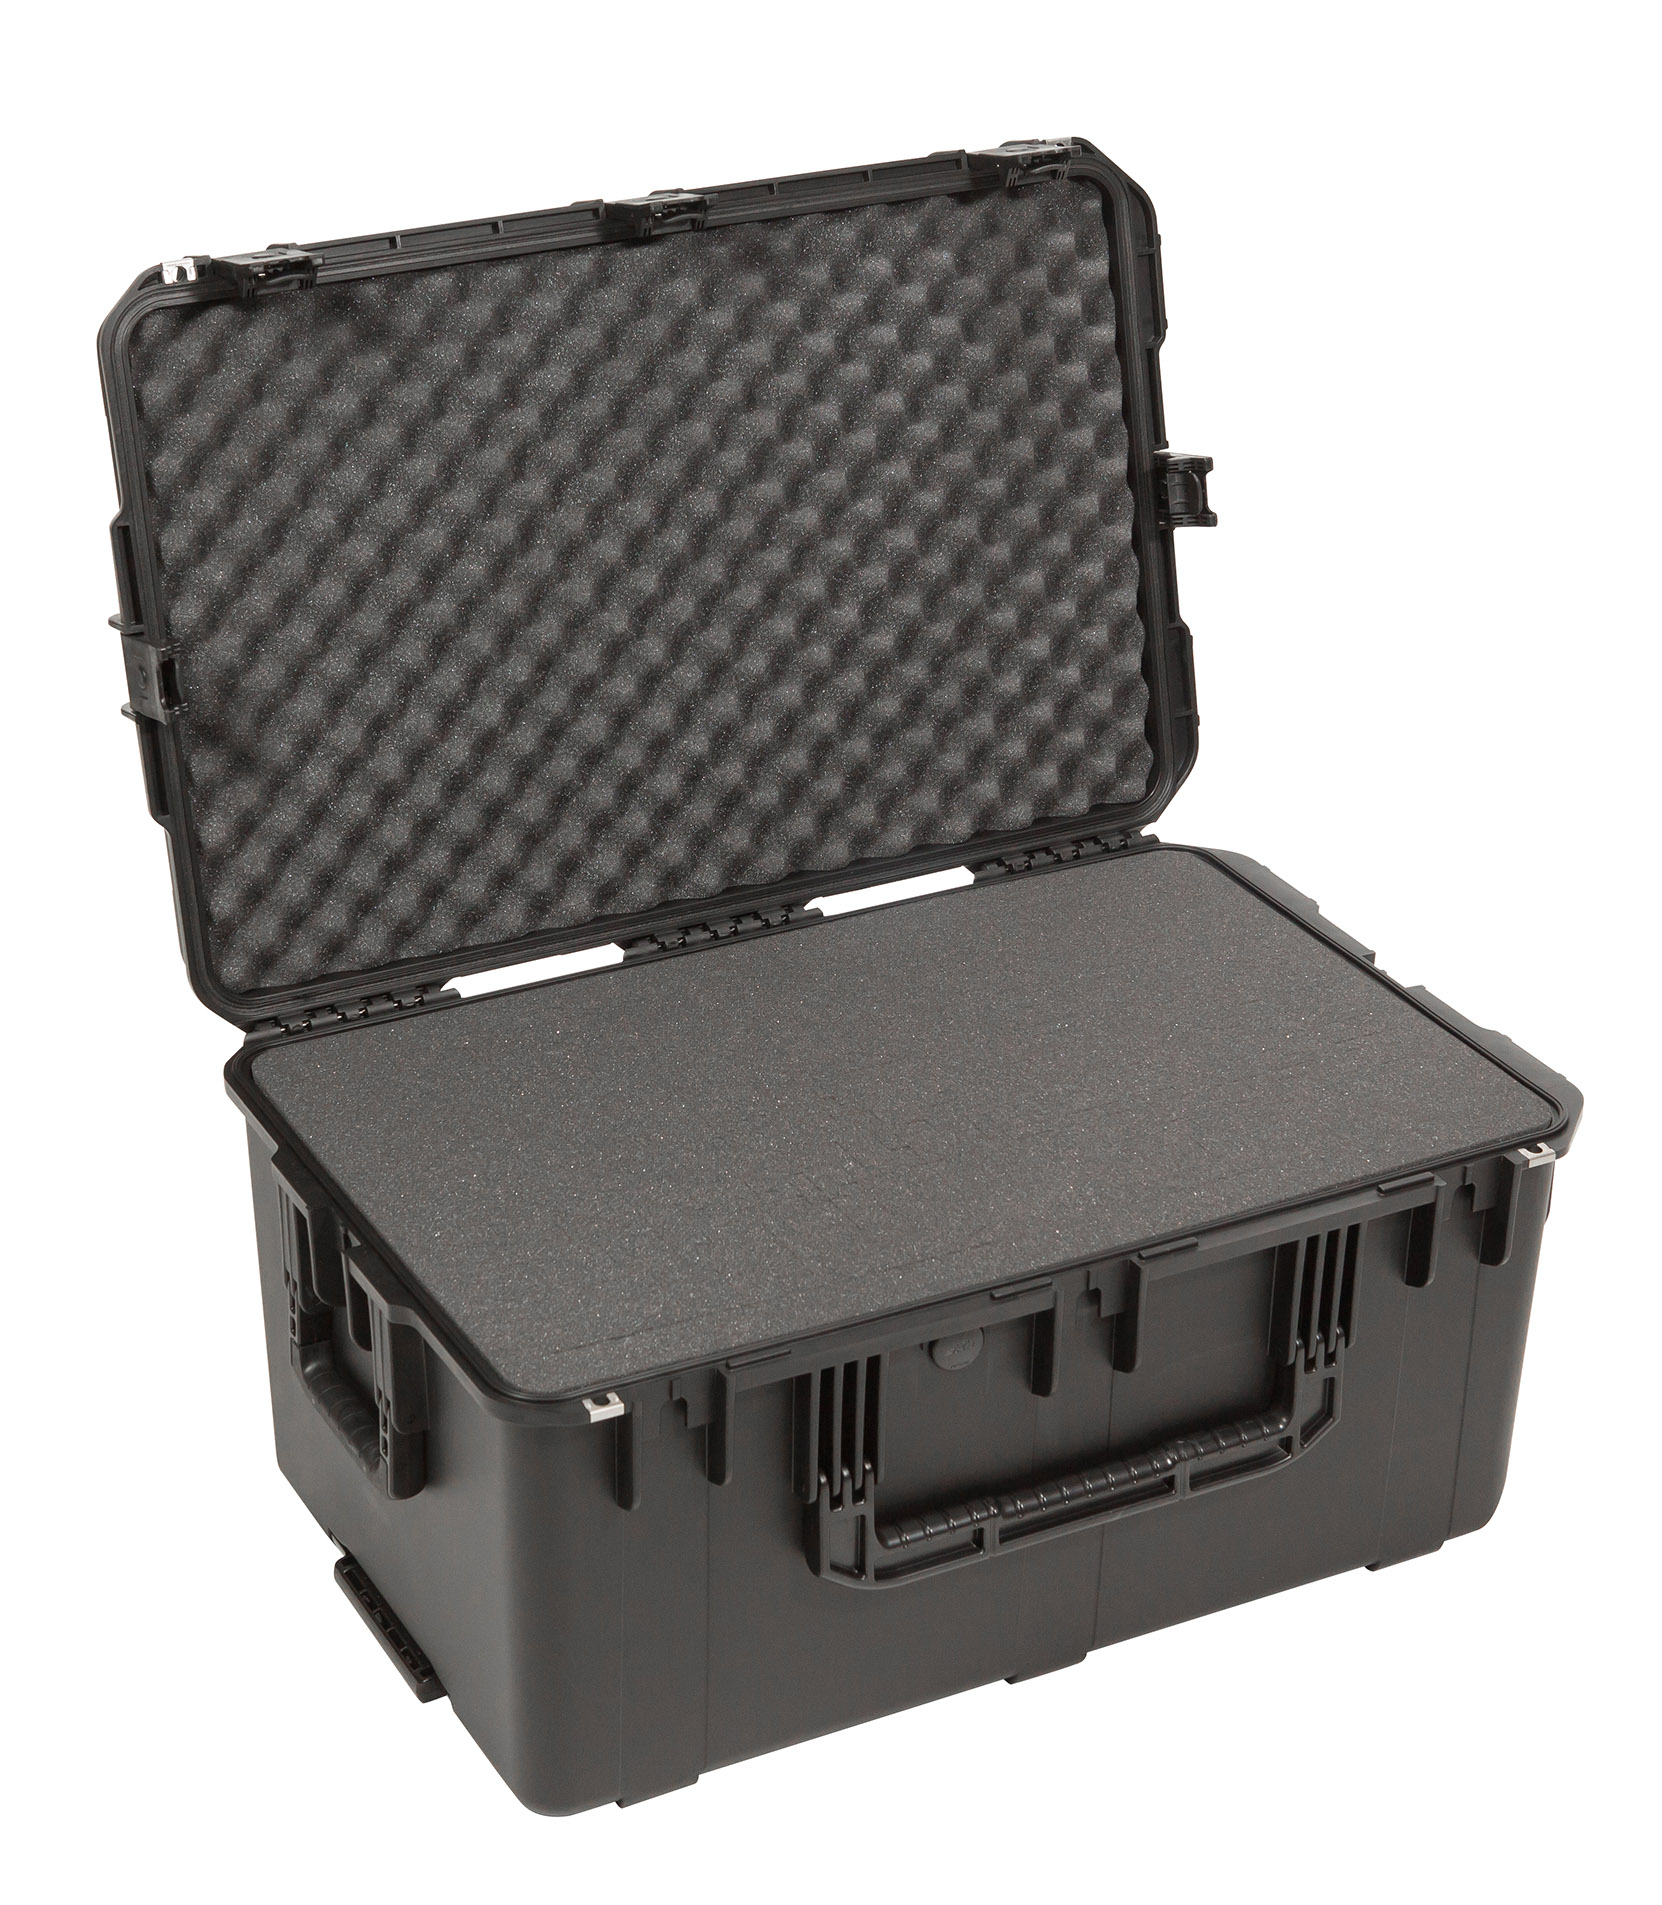 skb - 3I 2918 14BC 29 x 18 x 14 Cubed Foam with wheel - Melody House